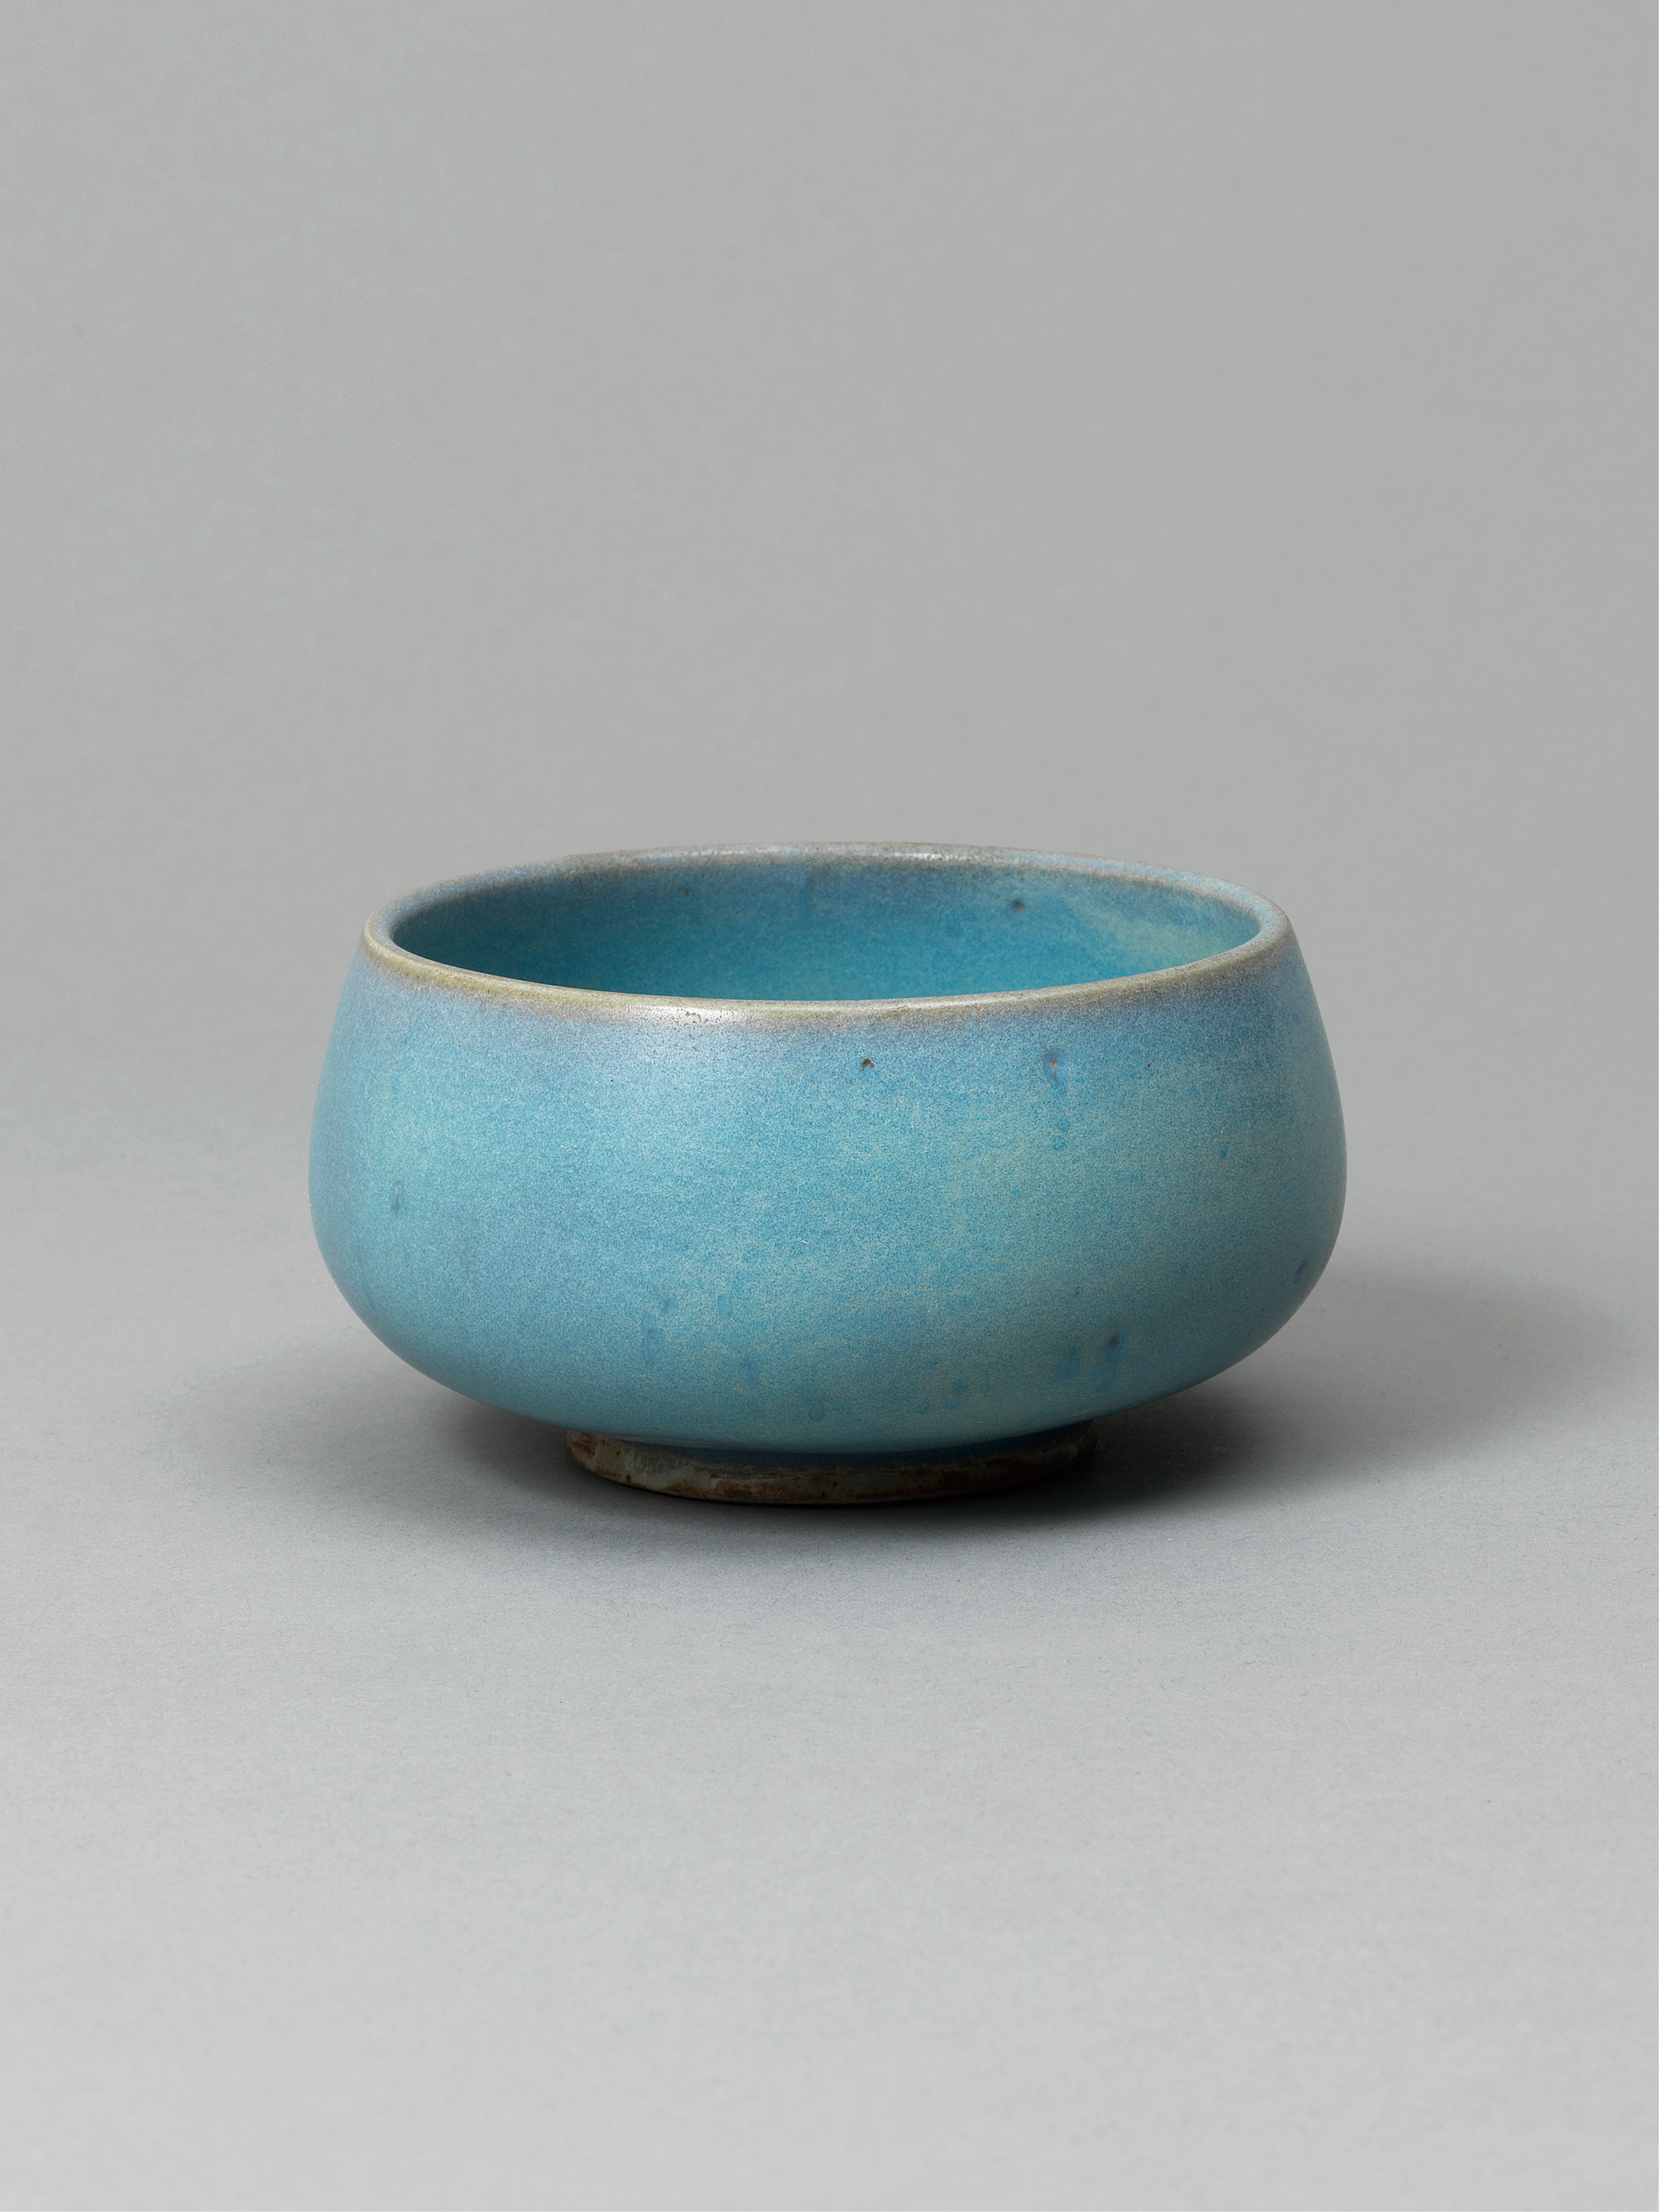 Lot 44 - A Song Dynasty jun glaze tea bowl northern Song Dynasty (960 - 1127)